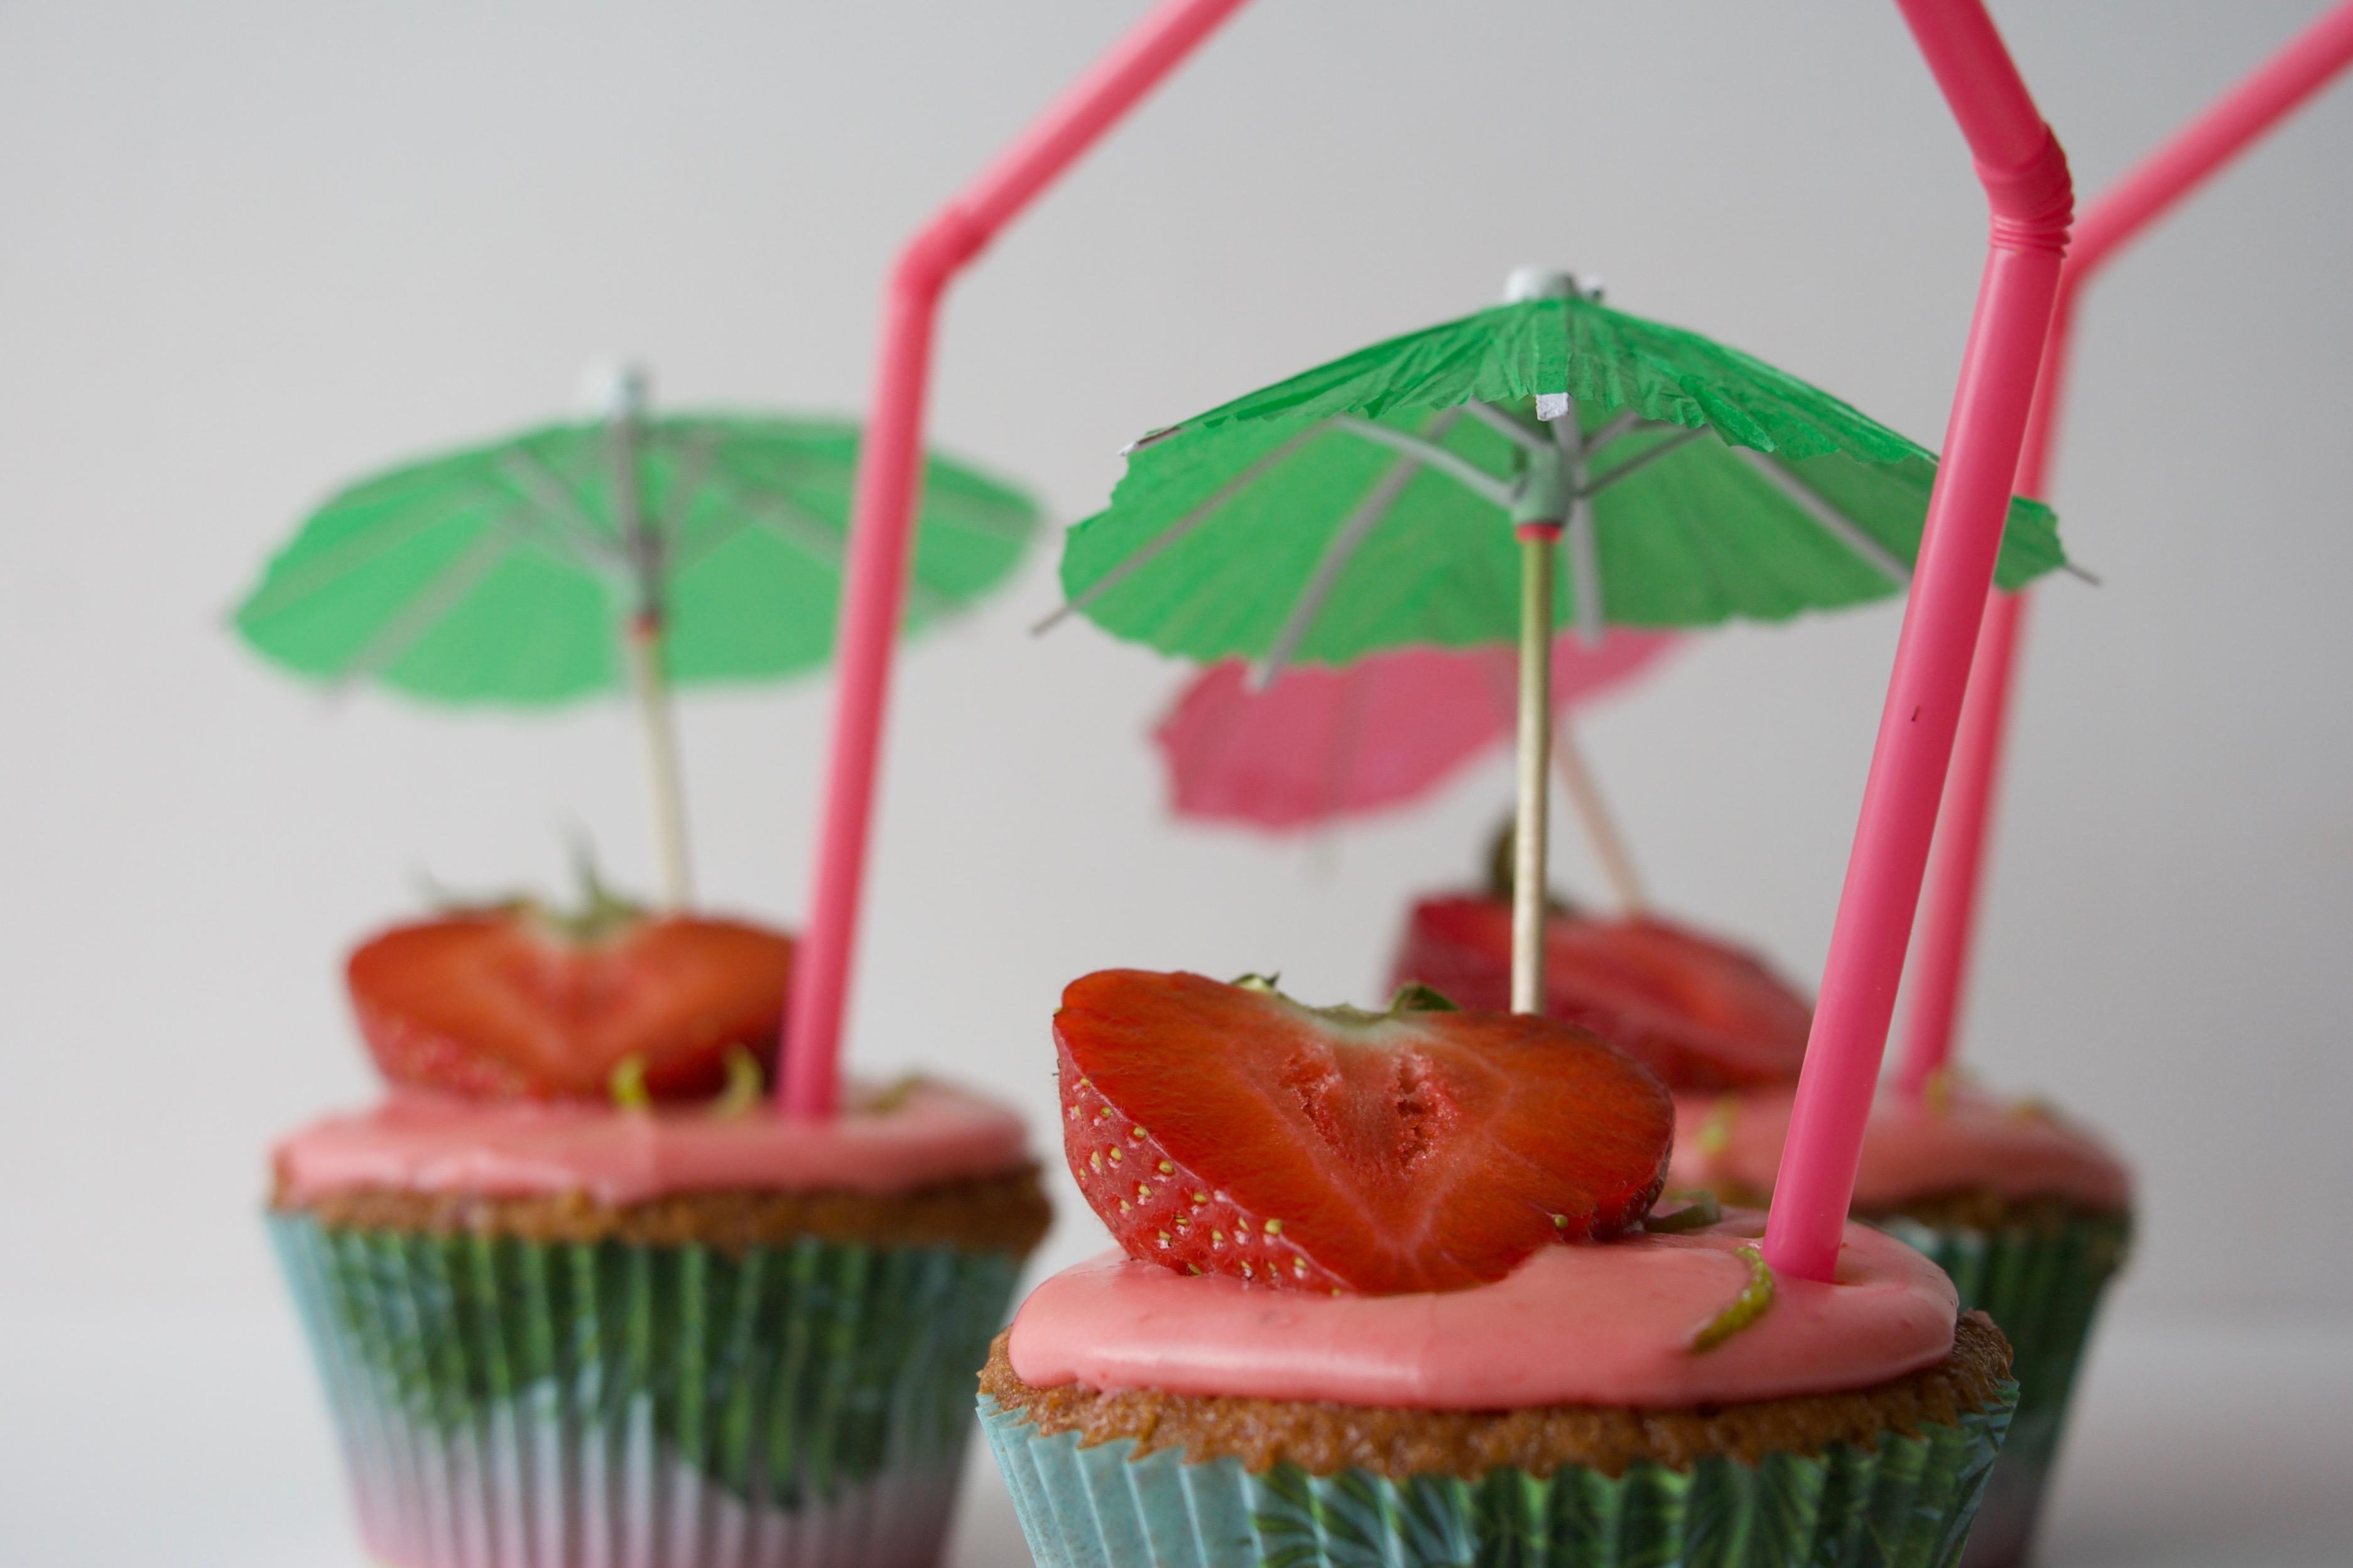 Stawberry daiquiri cupcakes